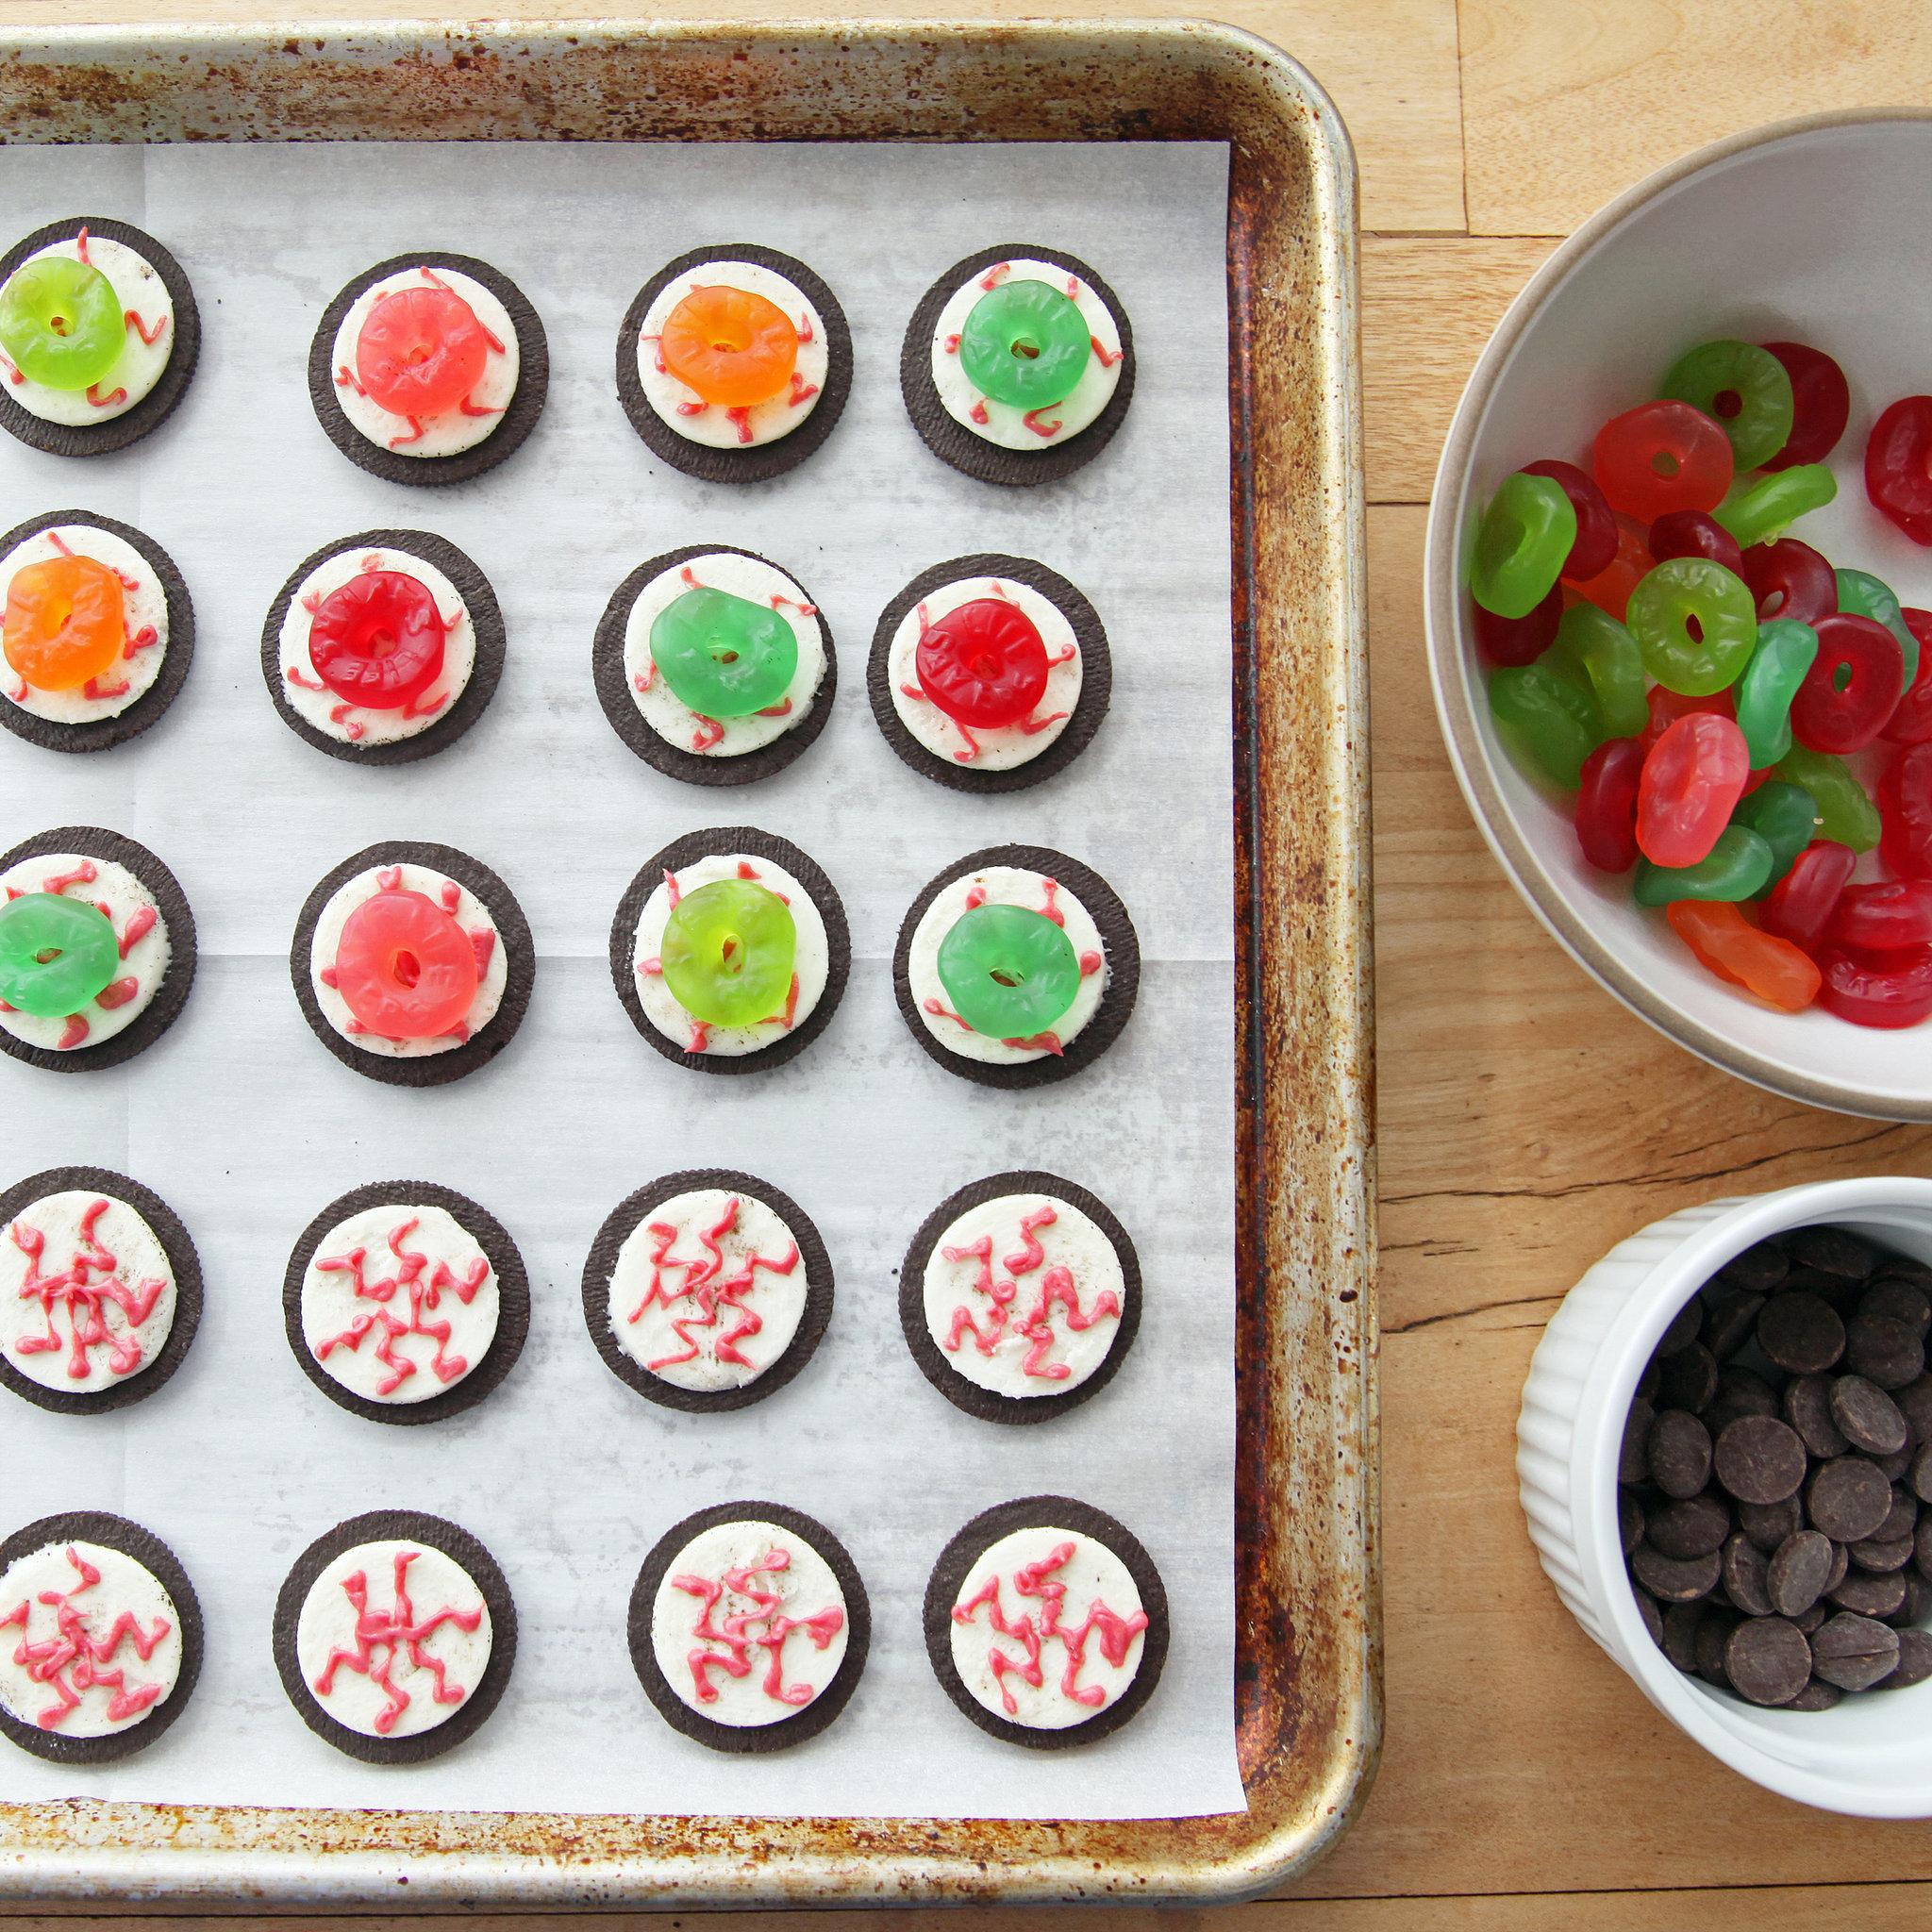 Easy oreo eyeballs recipe popsugar food share this link forumfinder Gallery